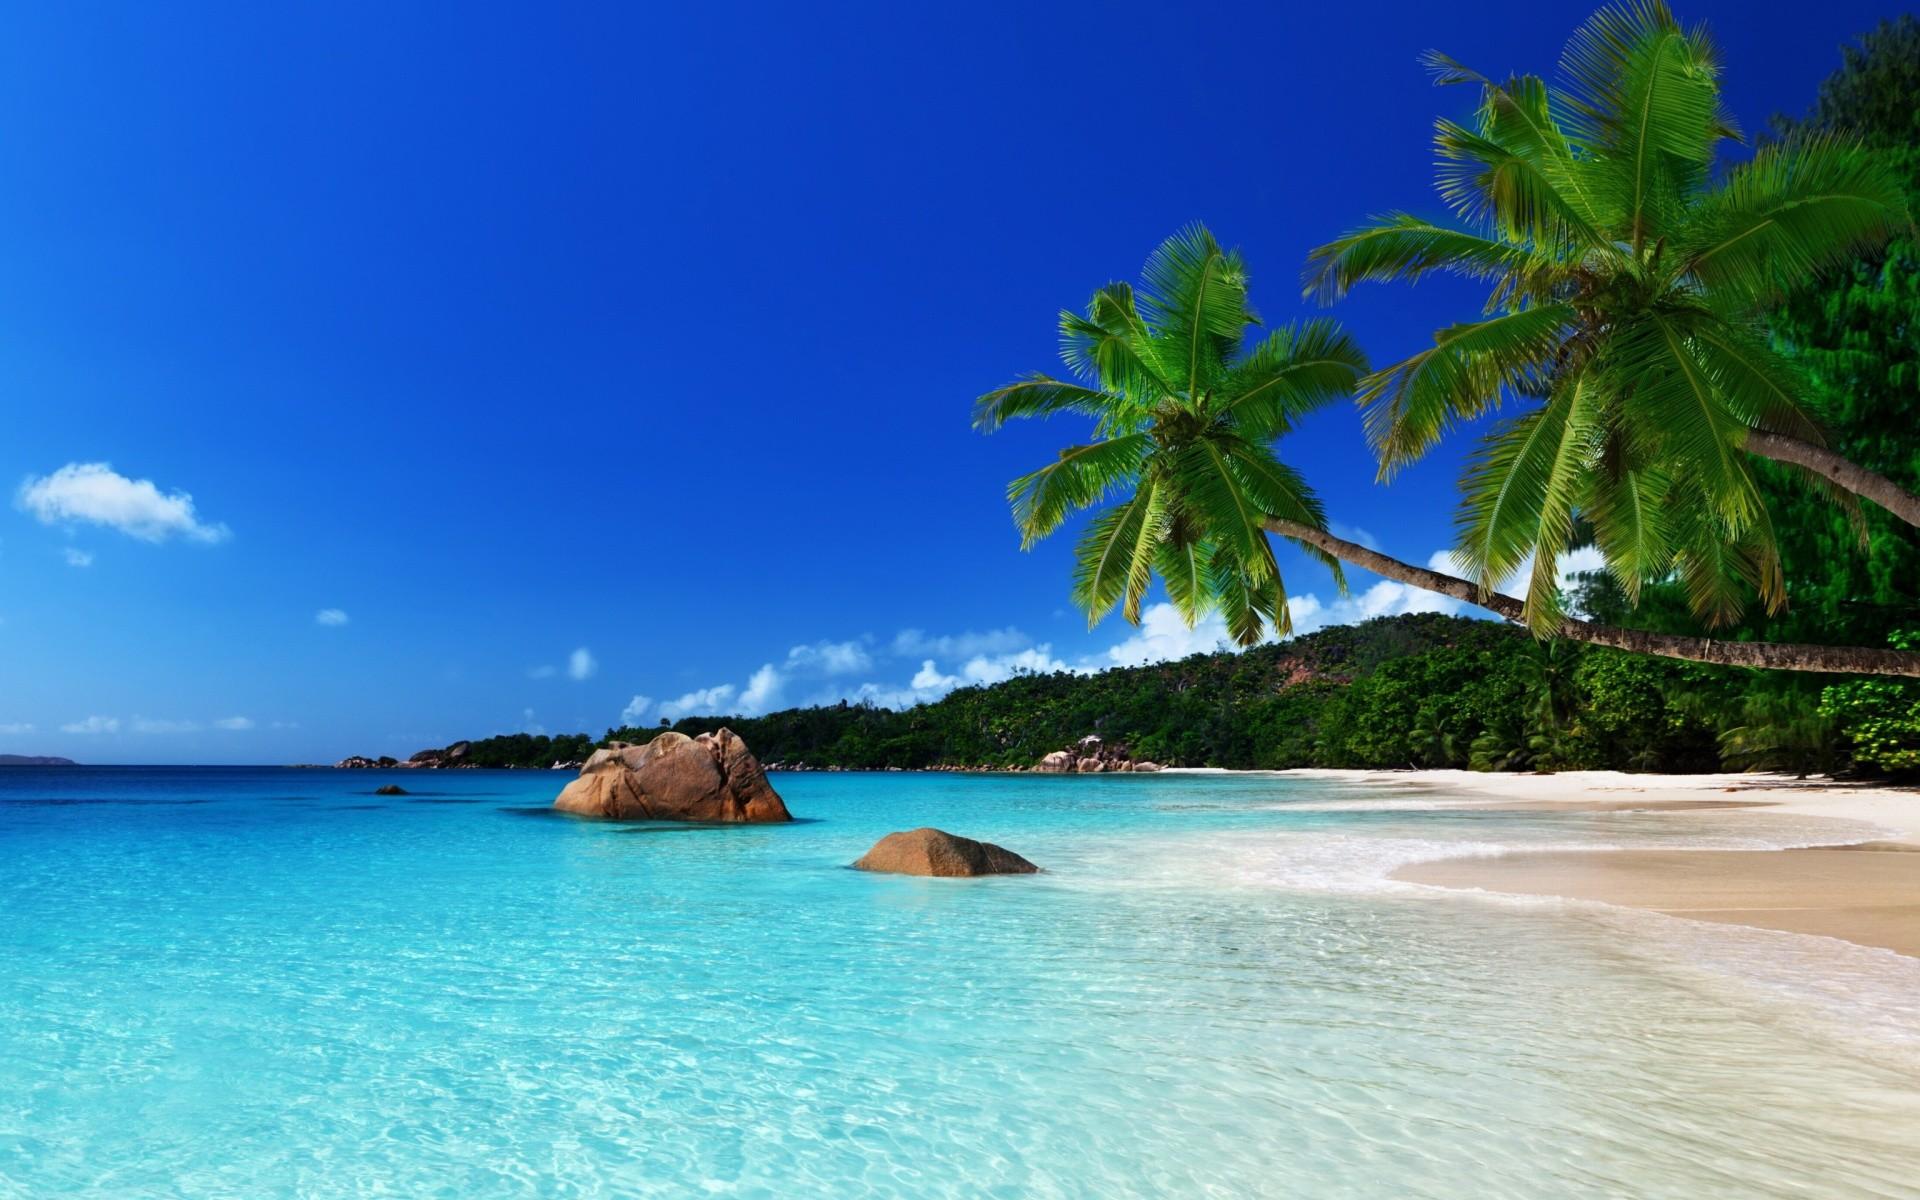 Beach Wallpaper: Jamaica Beach Wallpaper ·① WallpaperTag